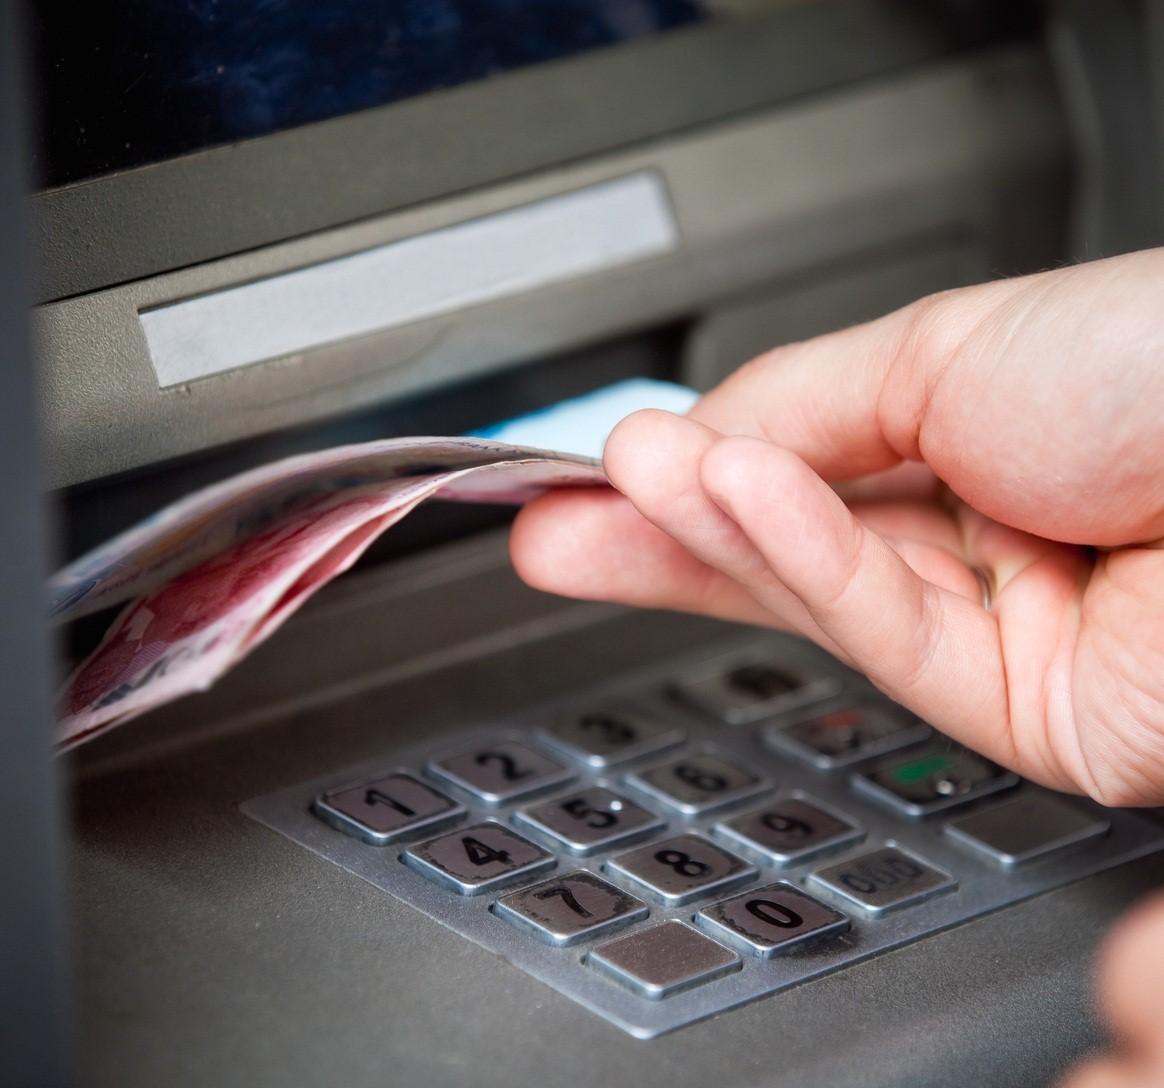 получить займ на карту онлайн срочно без отказа омск